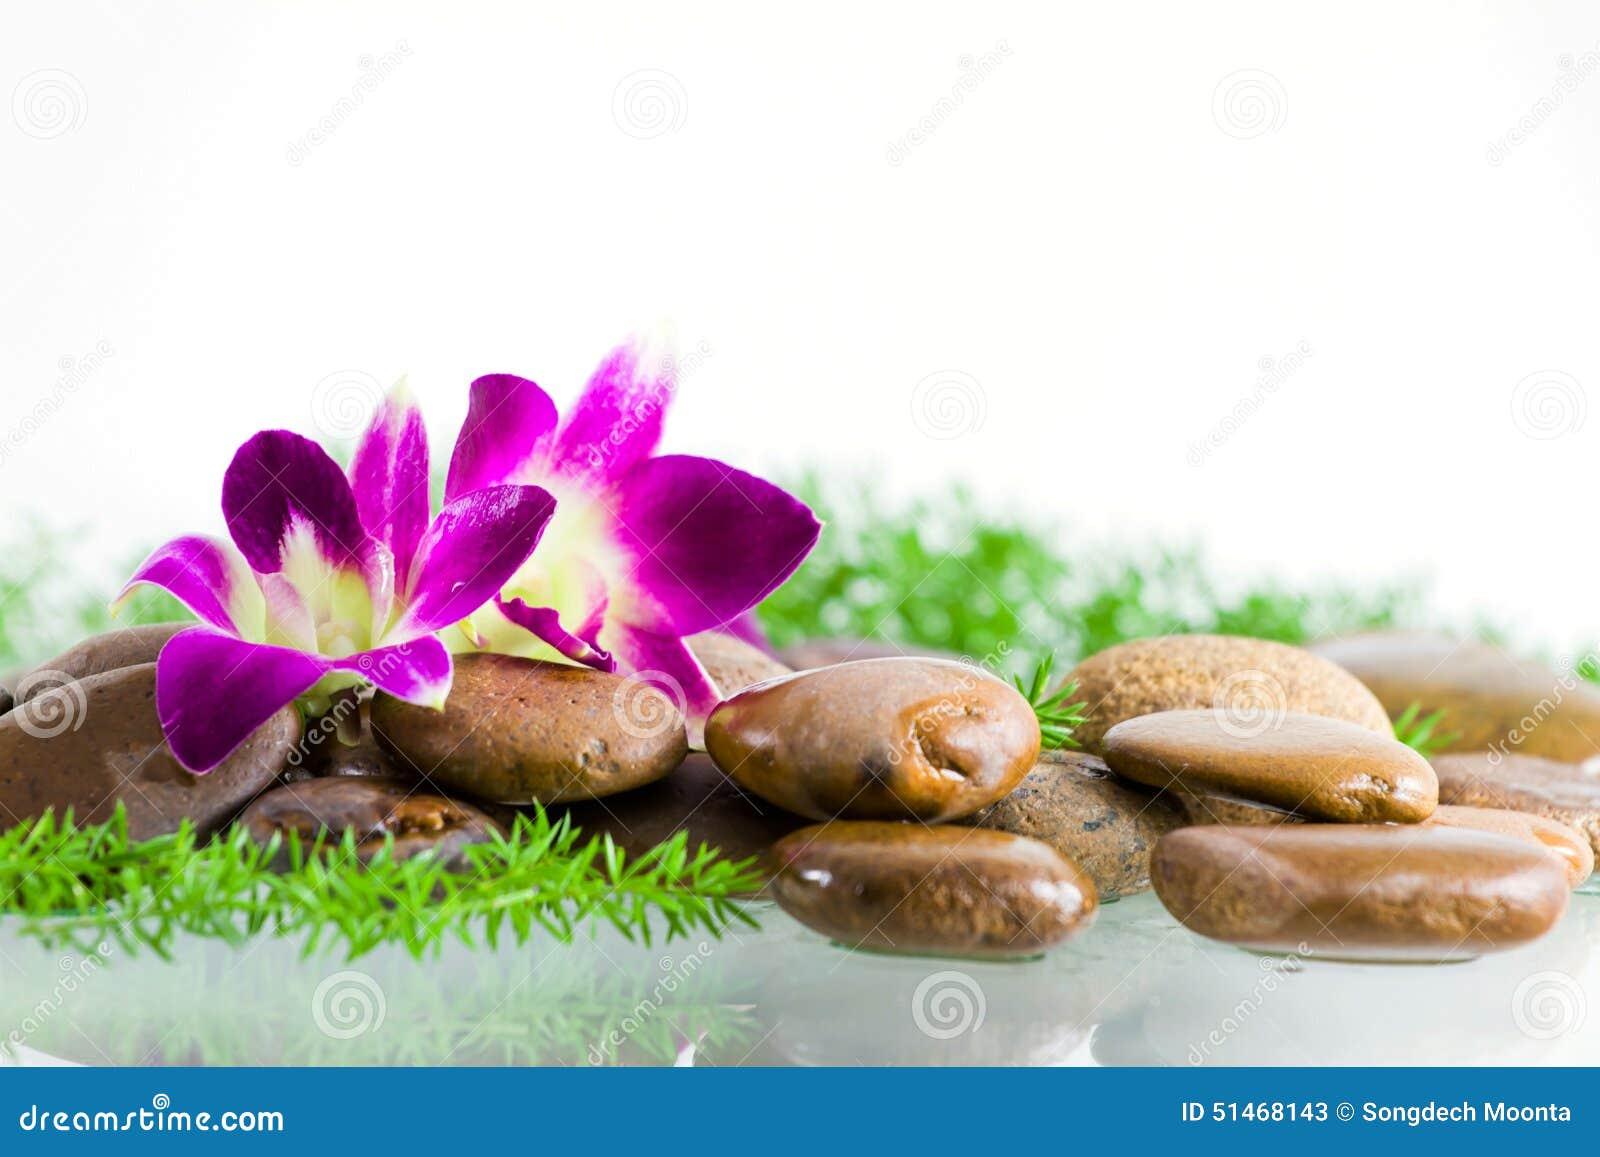 Violette orchideebloem